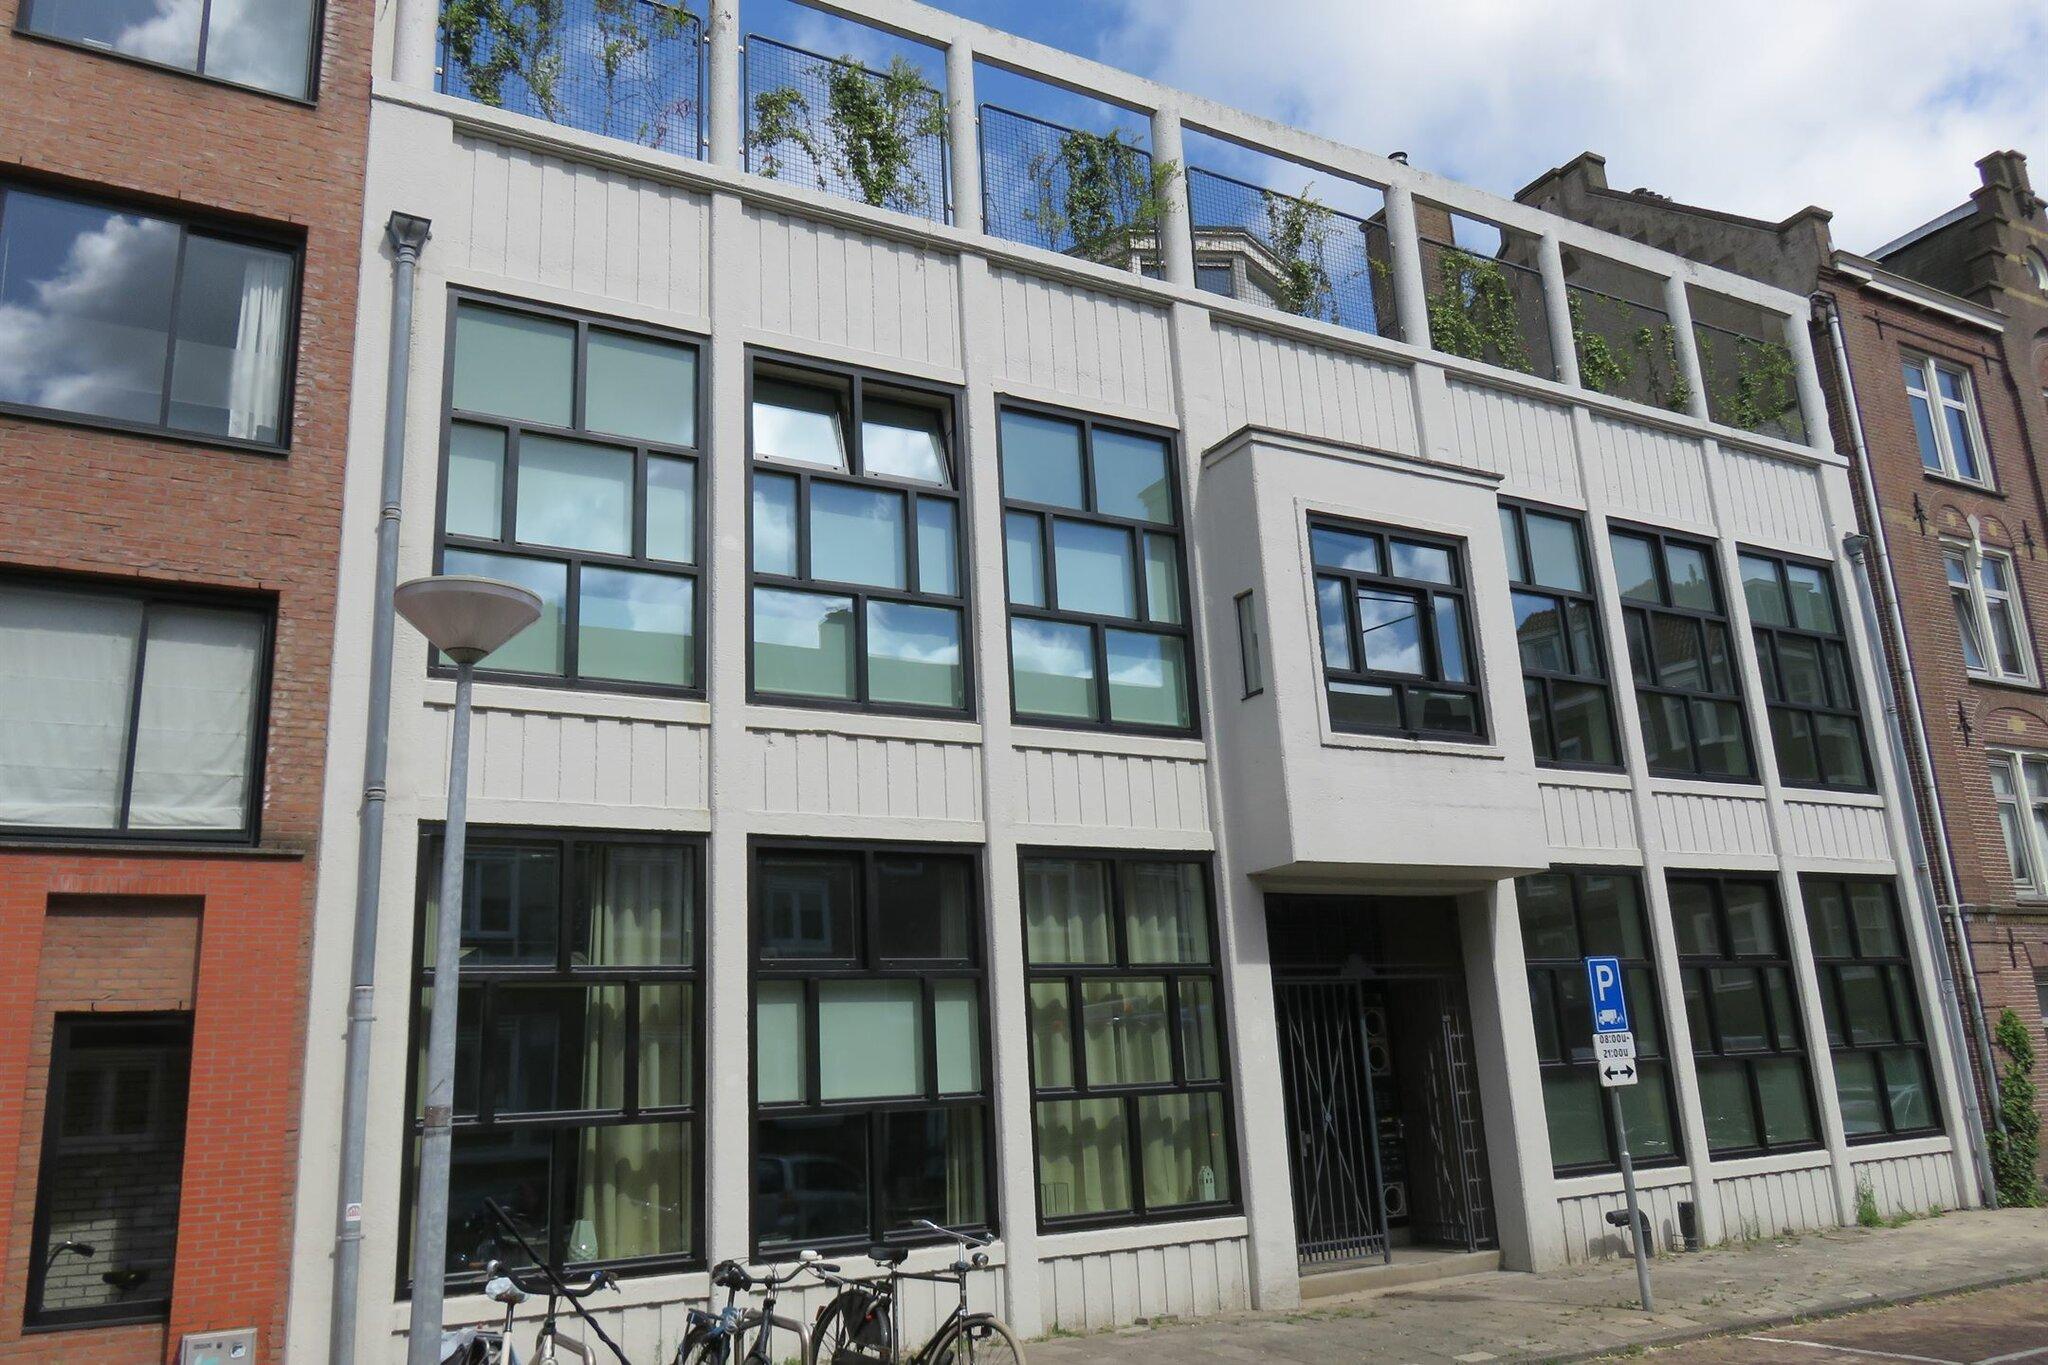 Kraijenhoffstraat 135-141 - Transactie